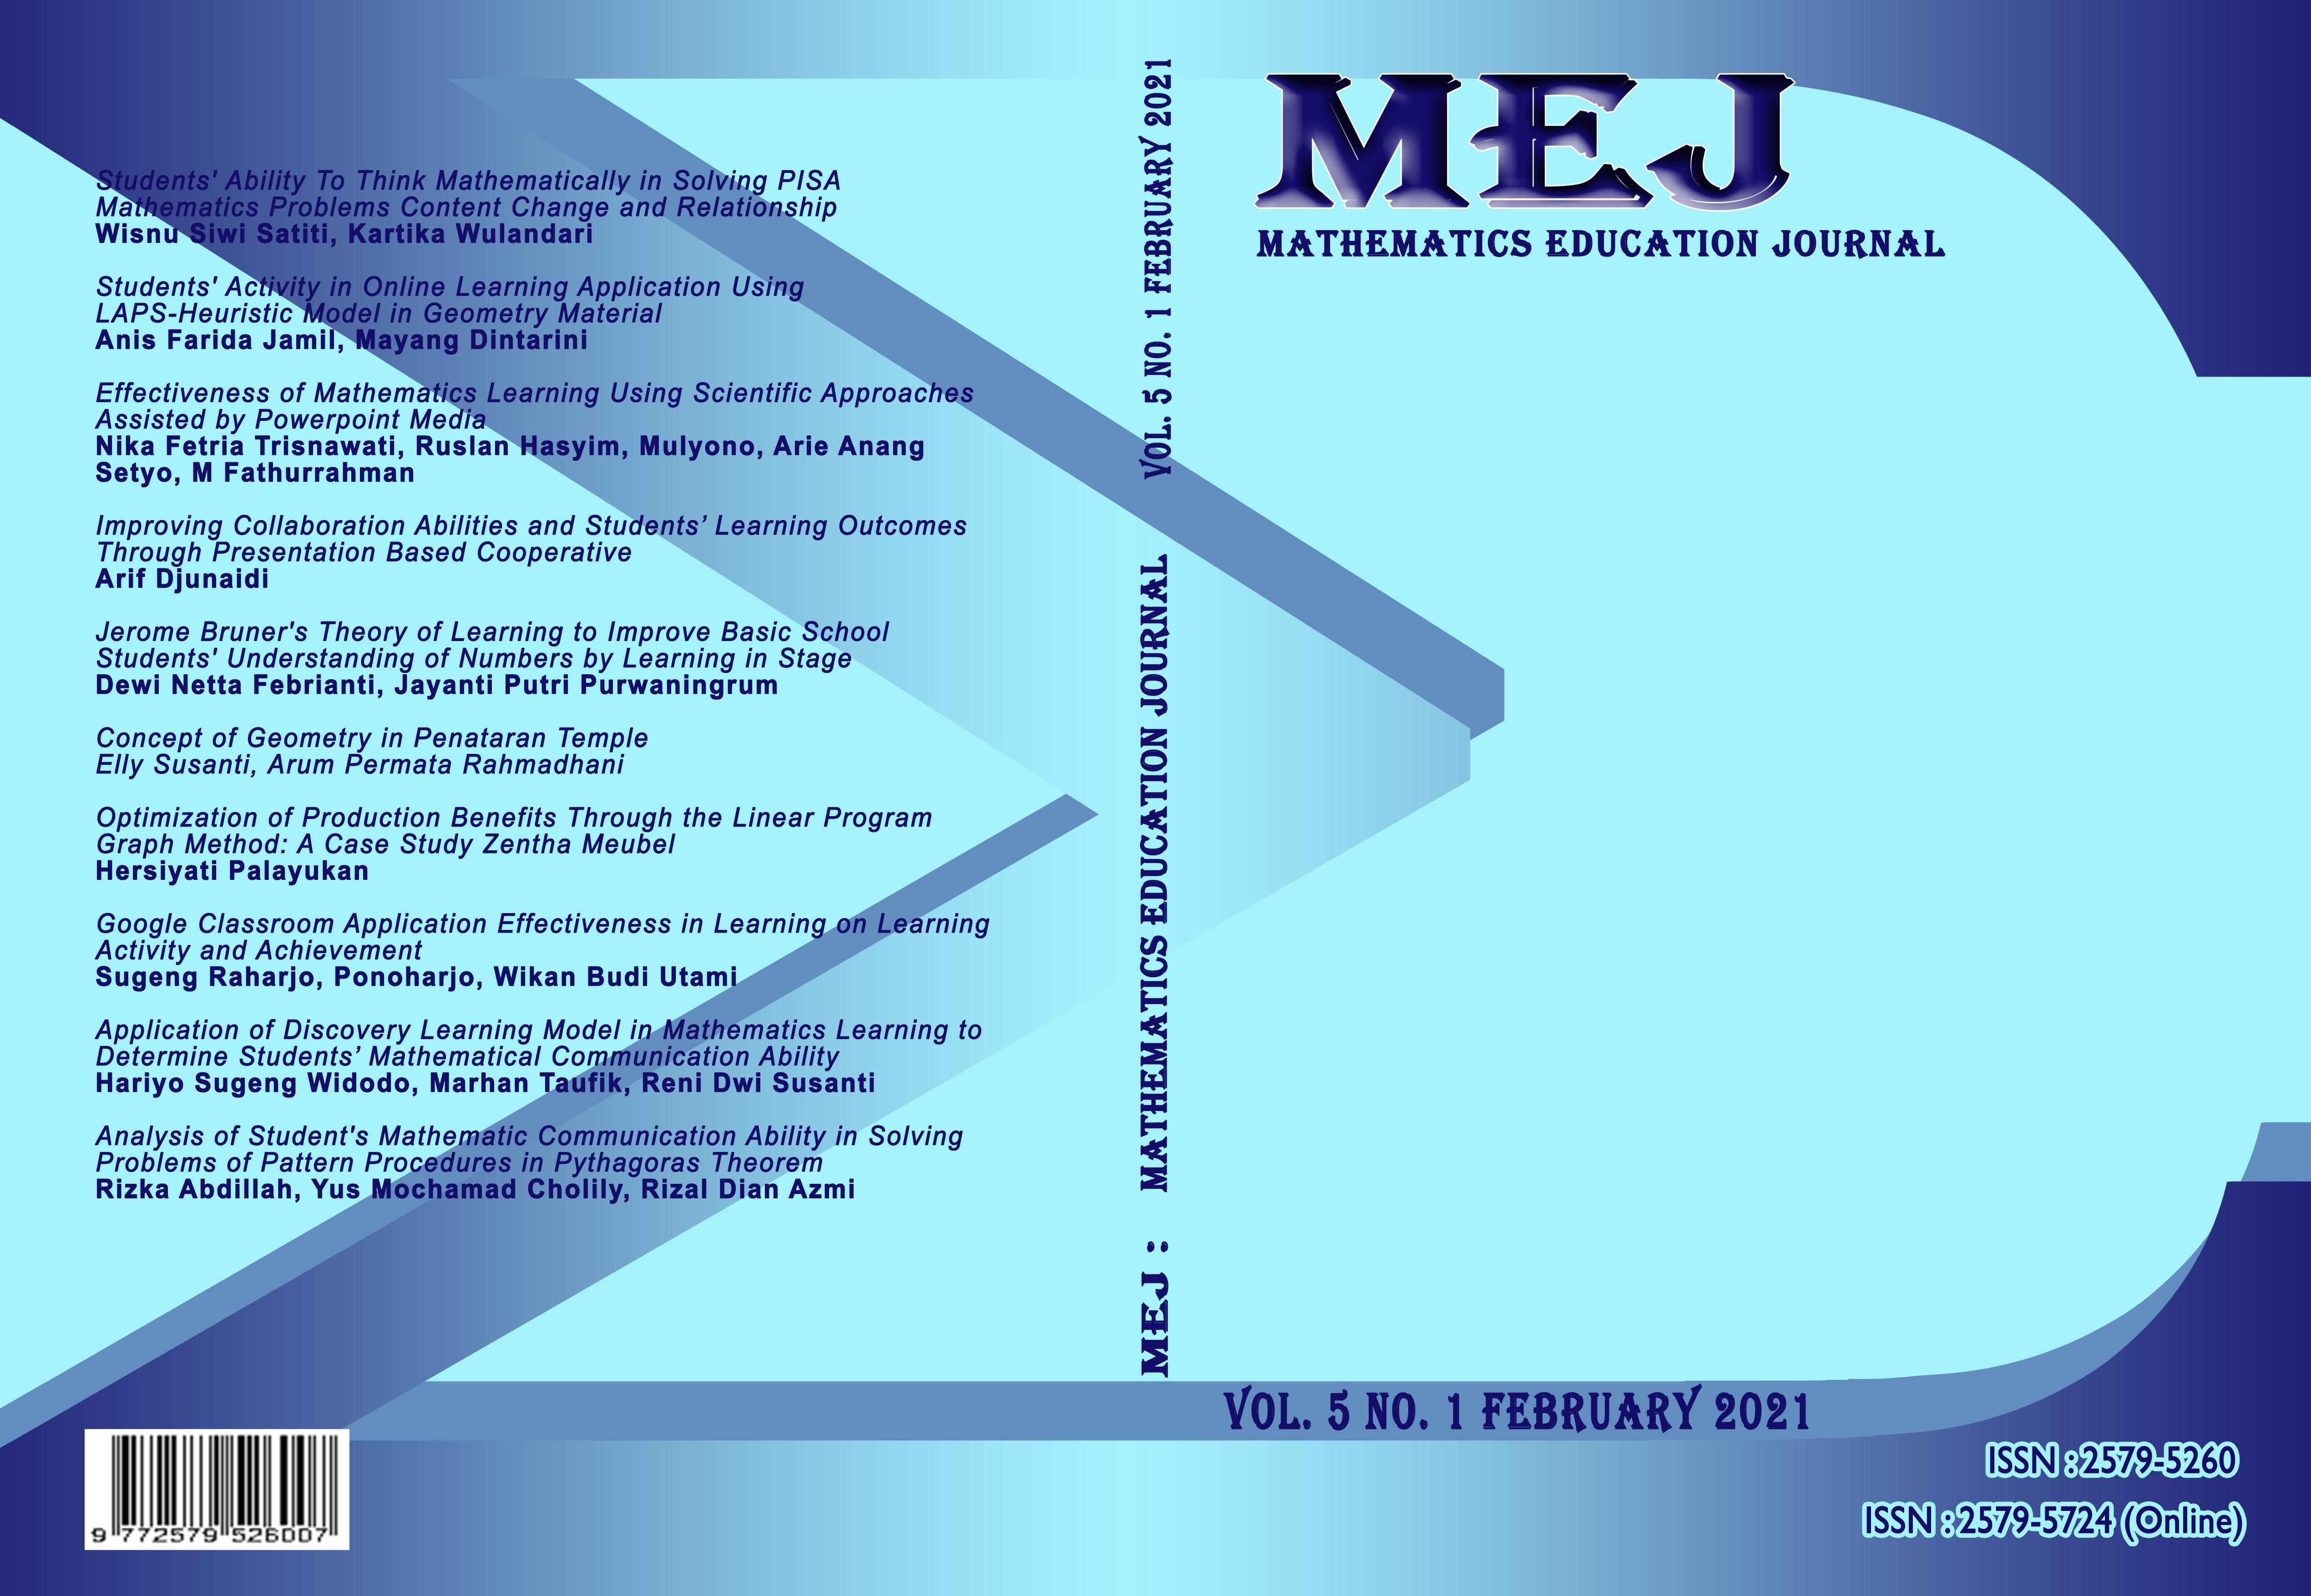 Vol. 5 No. 1 (2021)